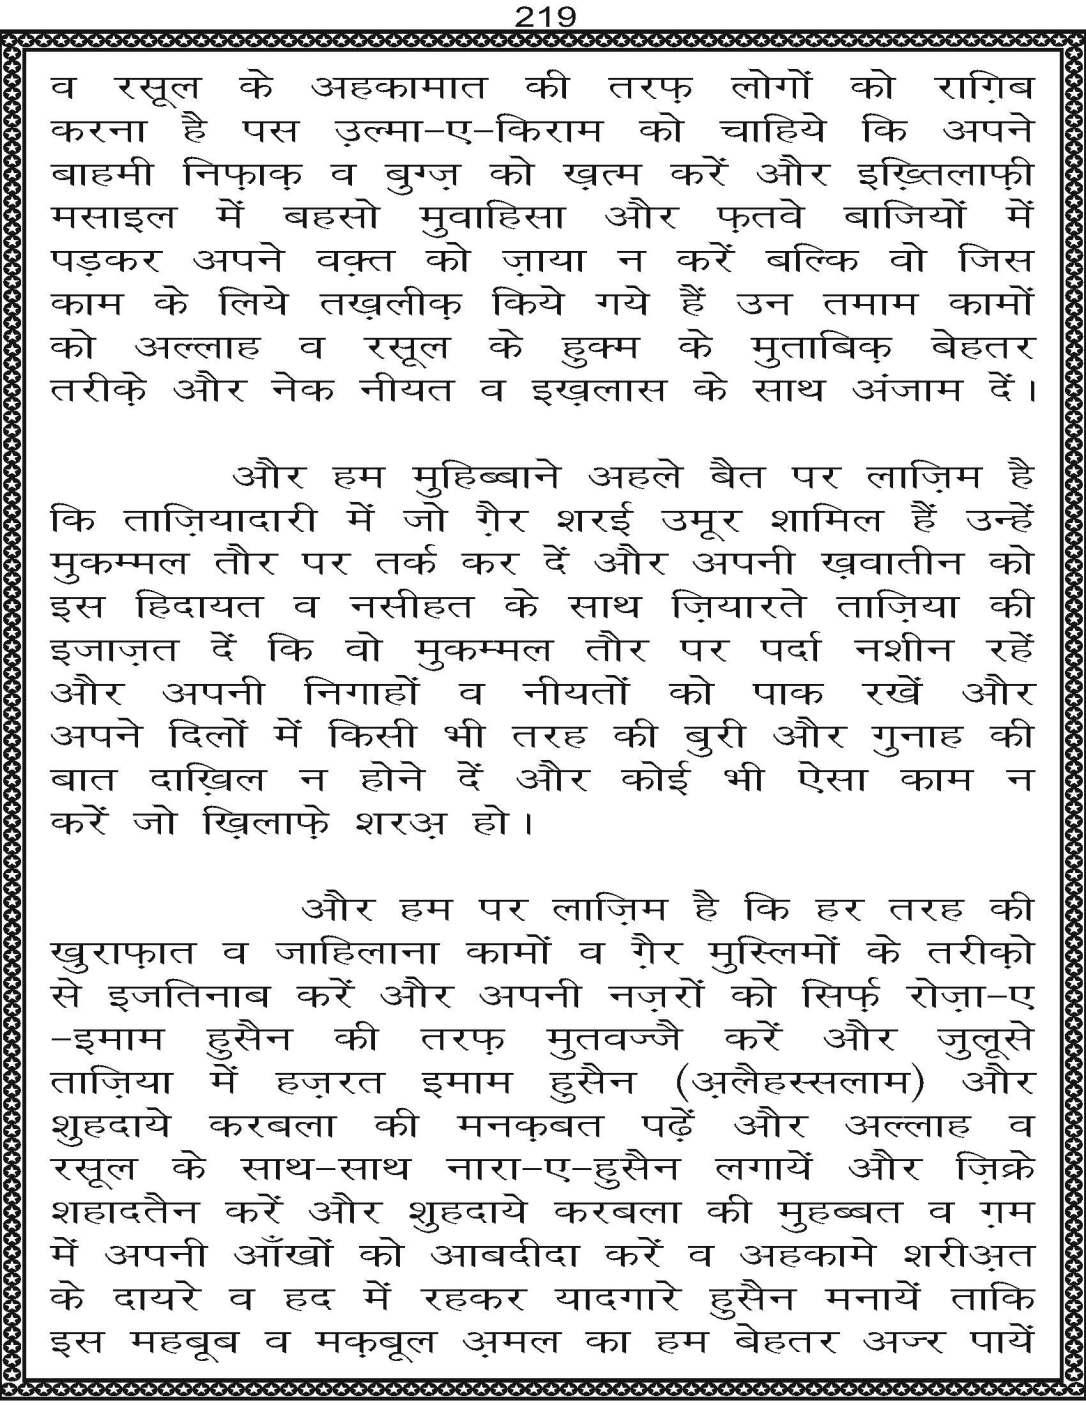 AzmateTaziyadari_Page_219